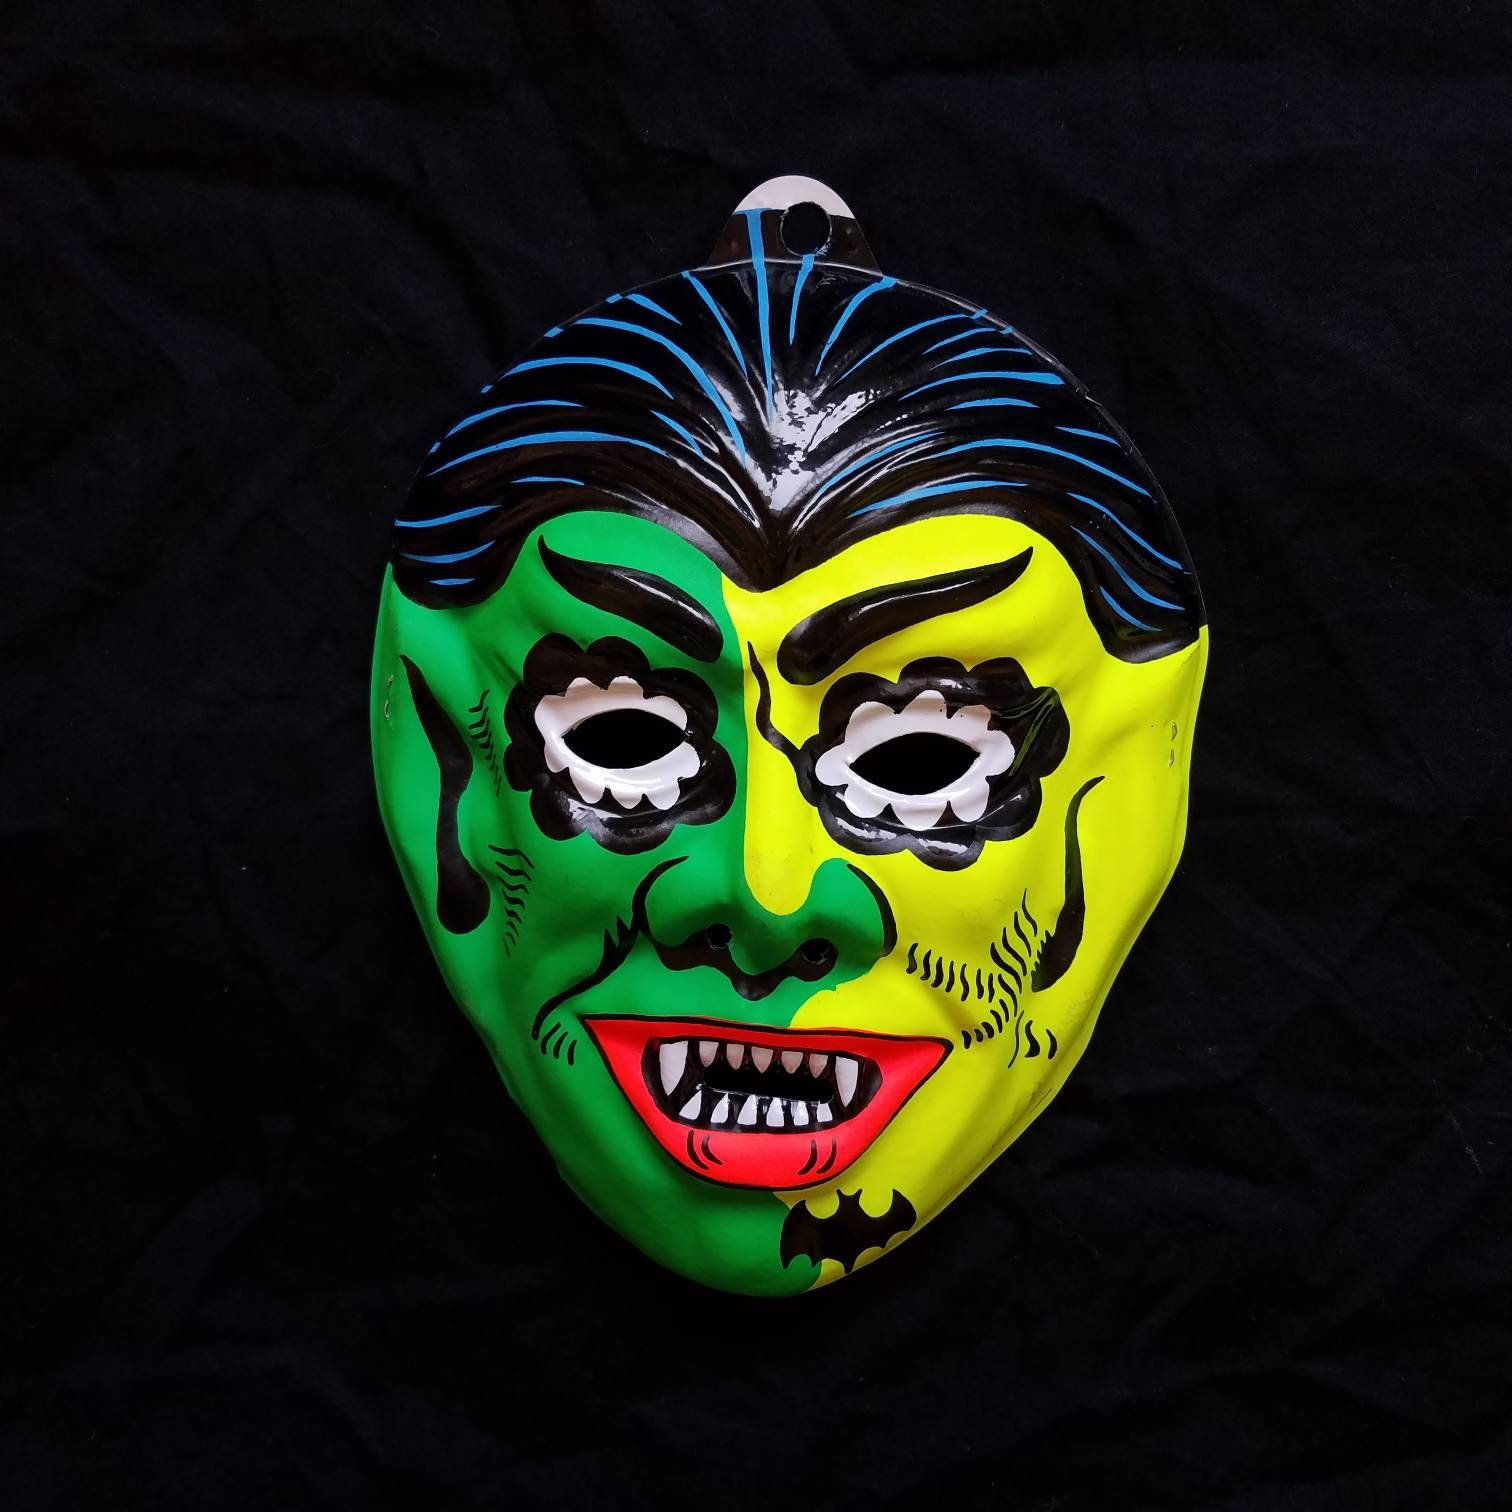 Vintage 1980s Kids Plastic Green Neon Vampire Dracula Bat